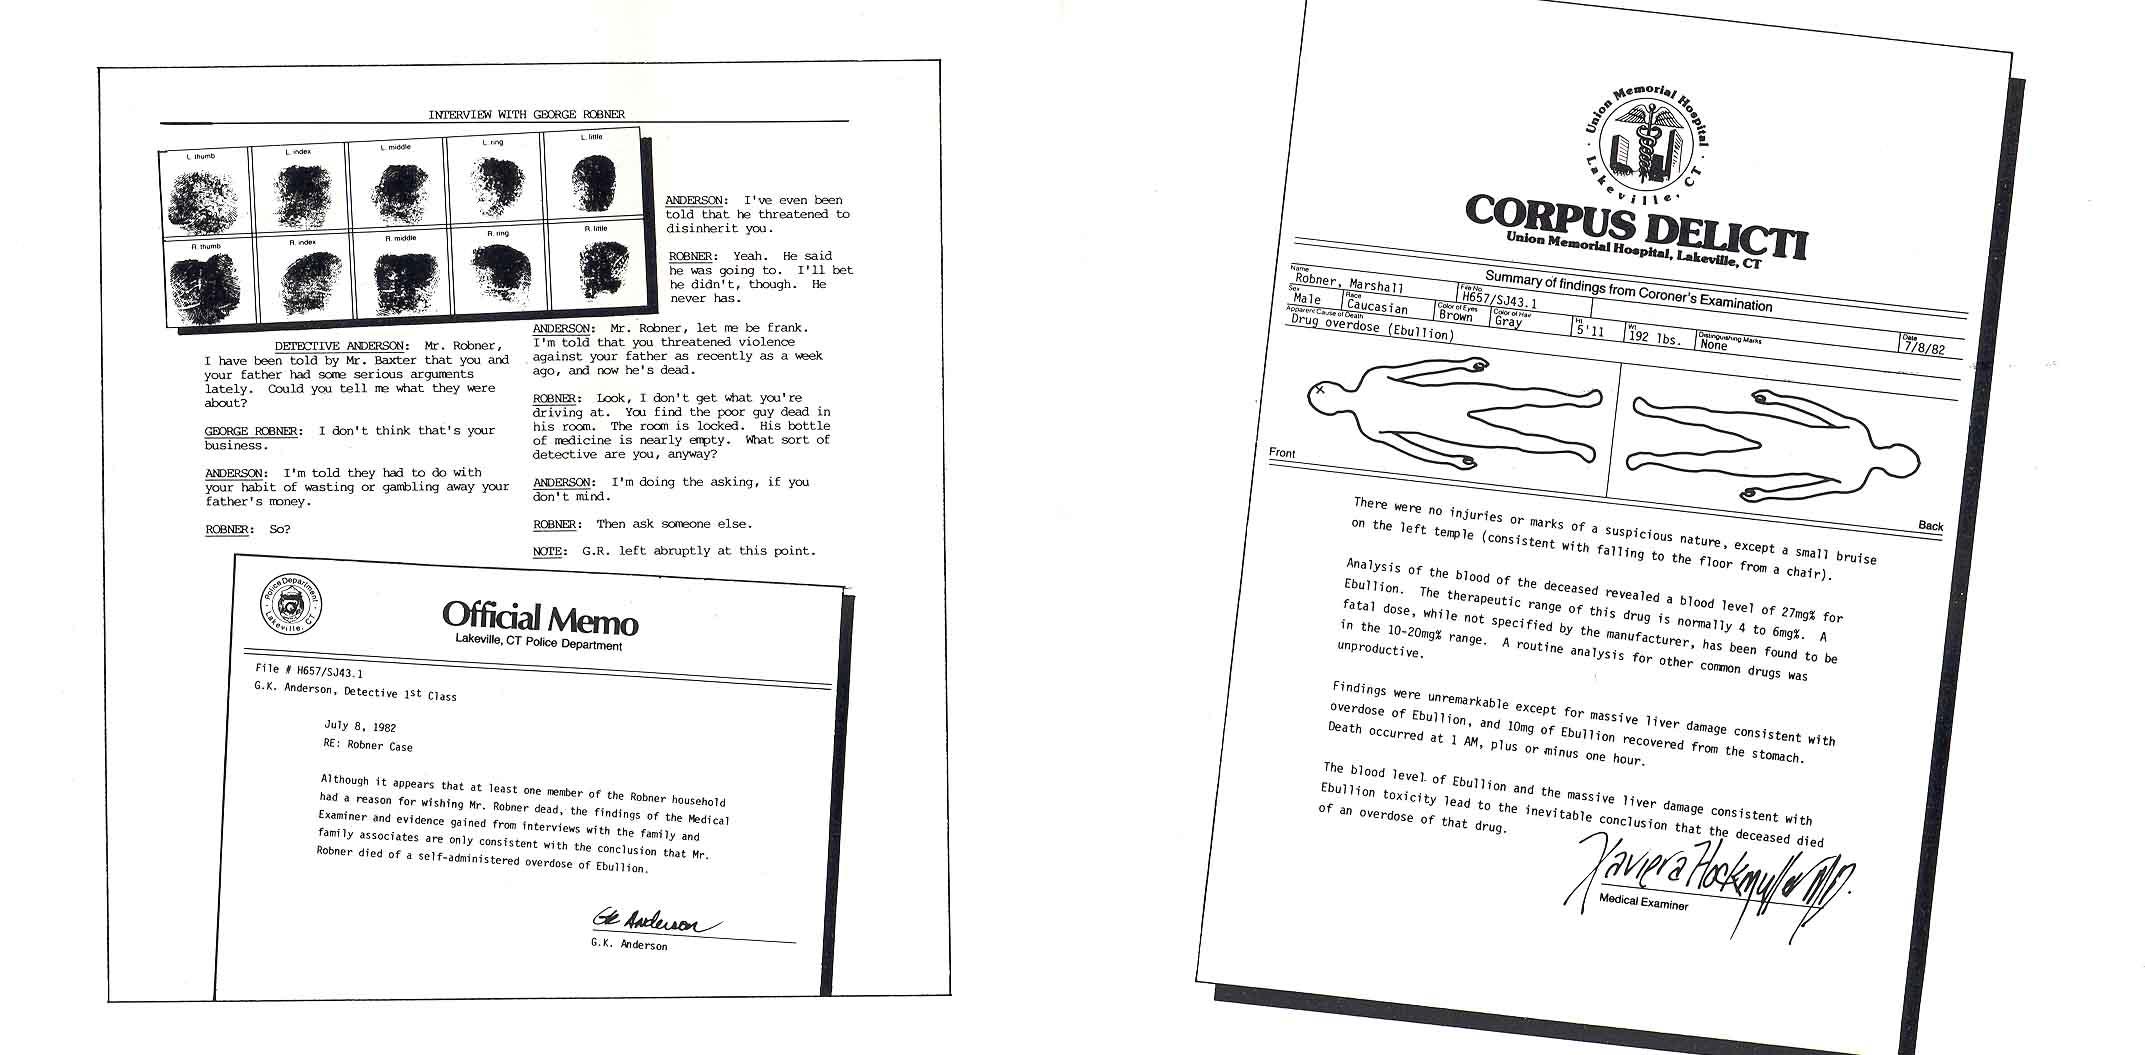 The Infocom Gallery Deadline Mastertronic